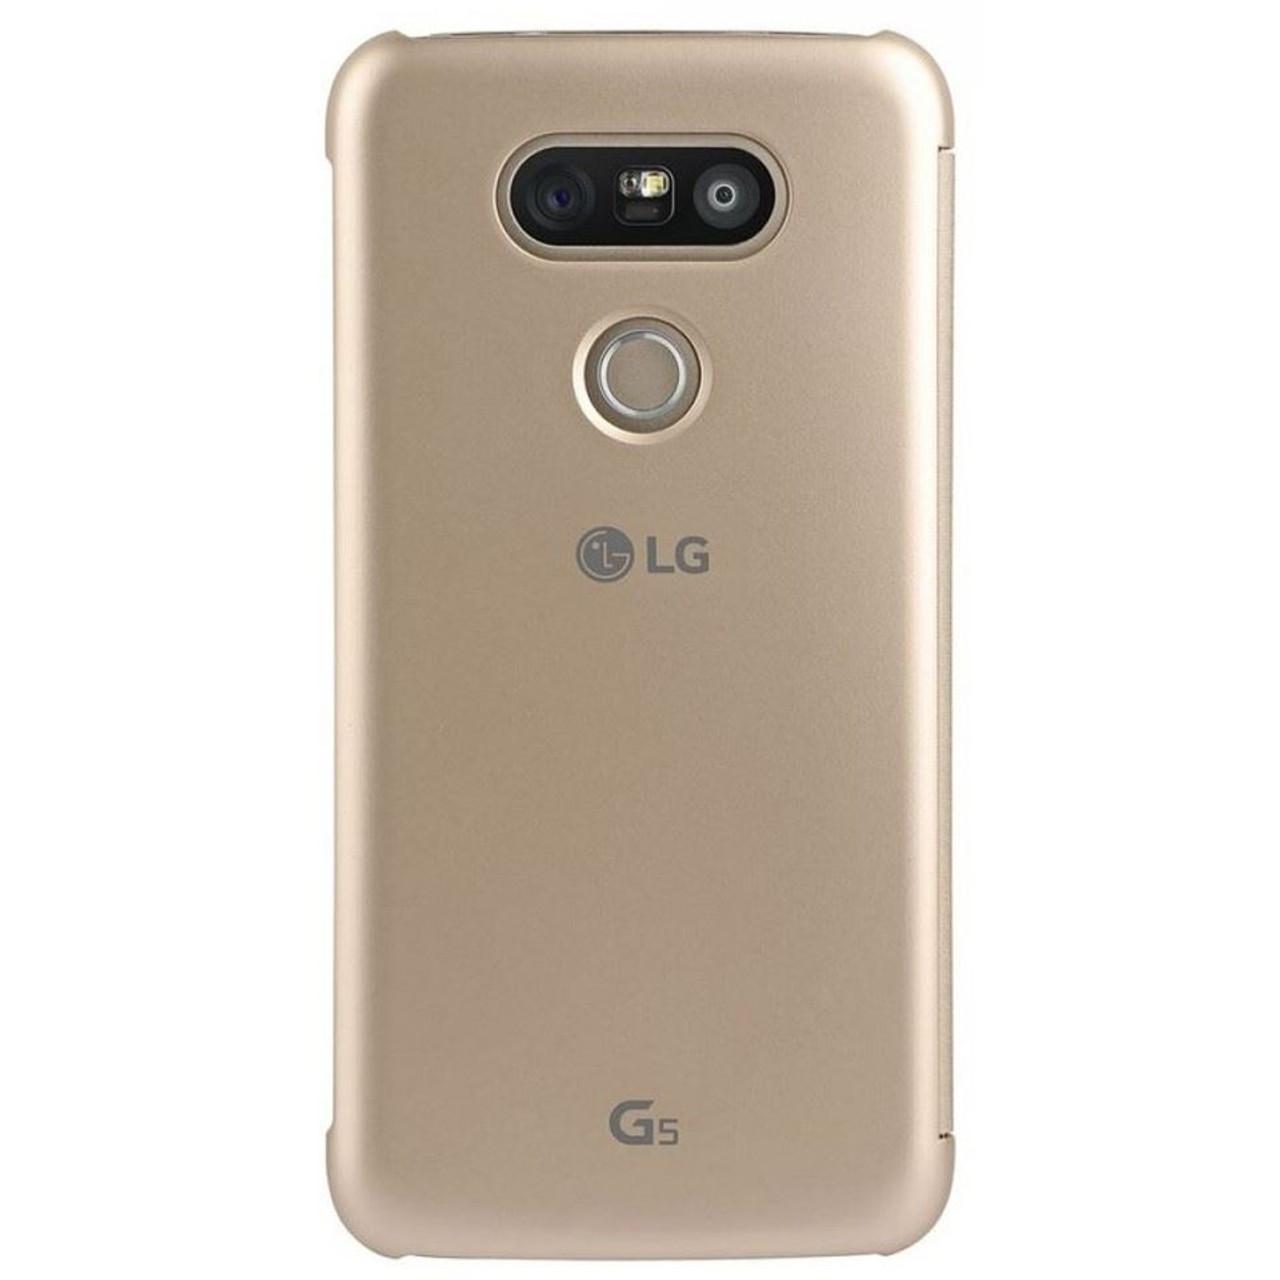 newest 6b439 9b6ef Genuine LG Mesh Folio View Cover Case for LG G5 - Gold